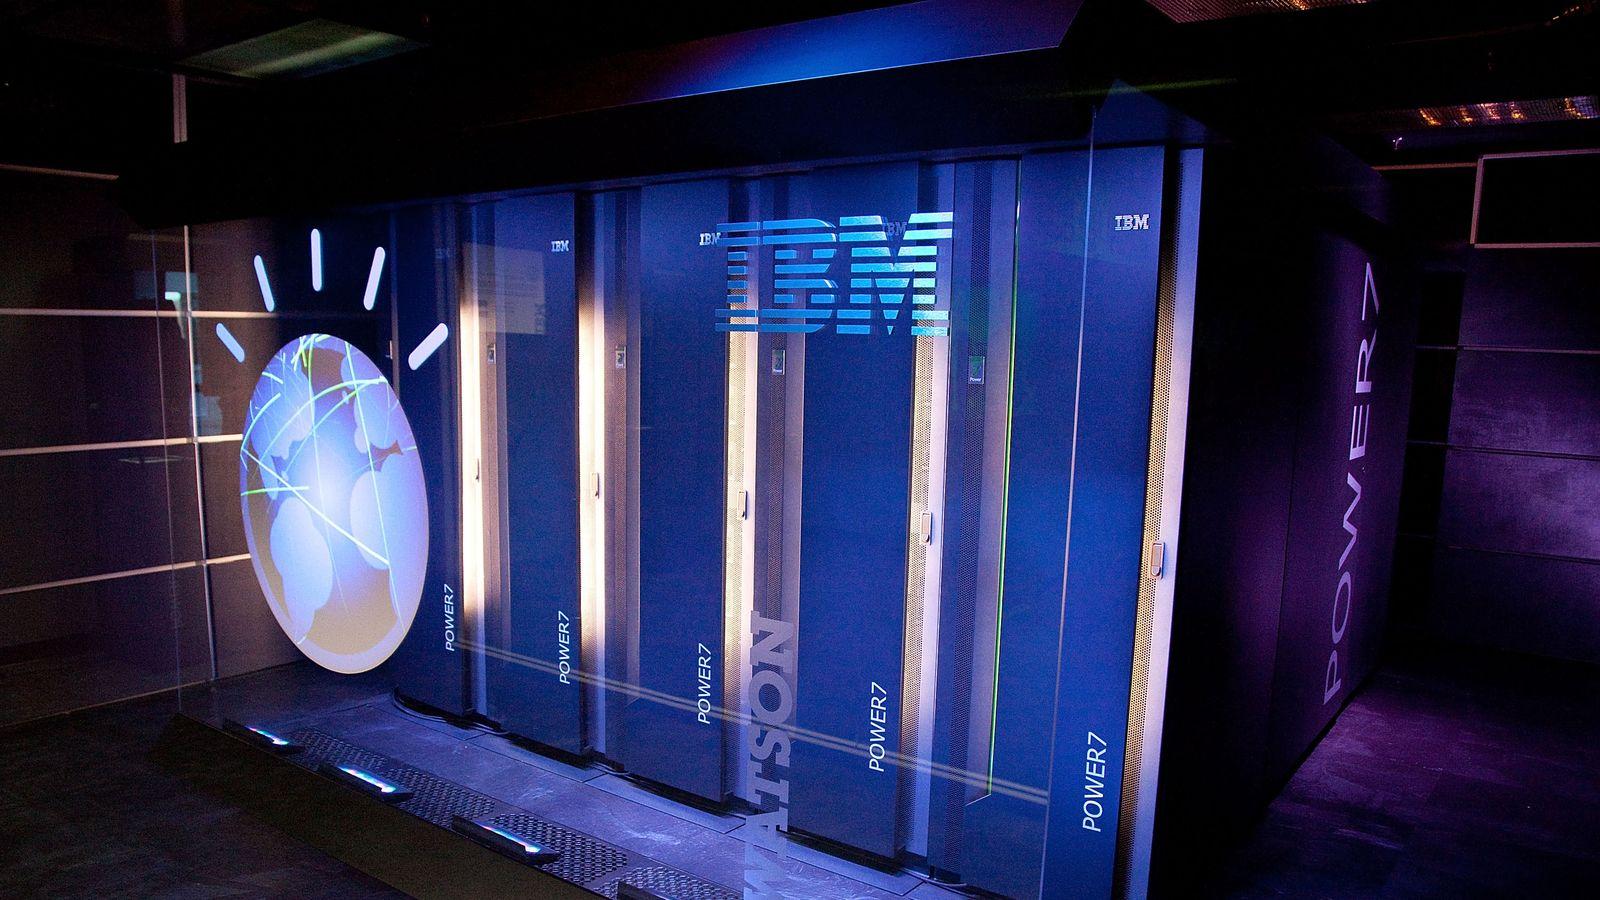 ibm-watson-cyber-security_xnc7